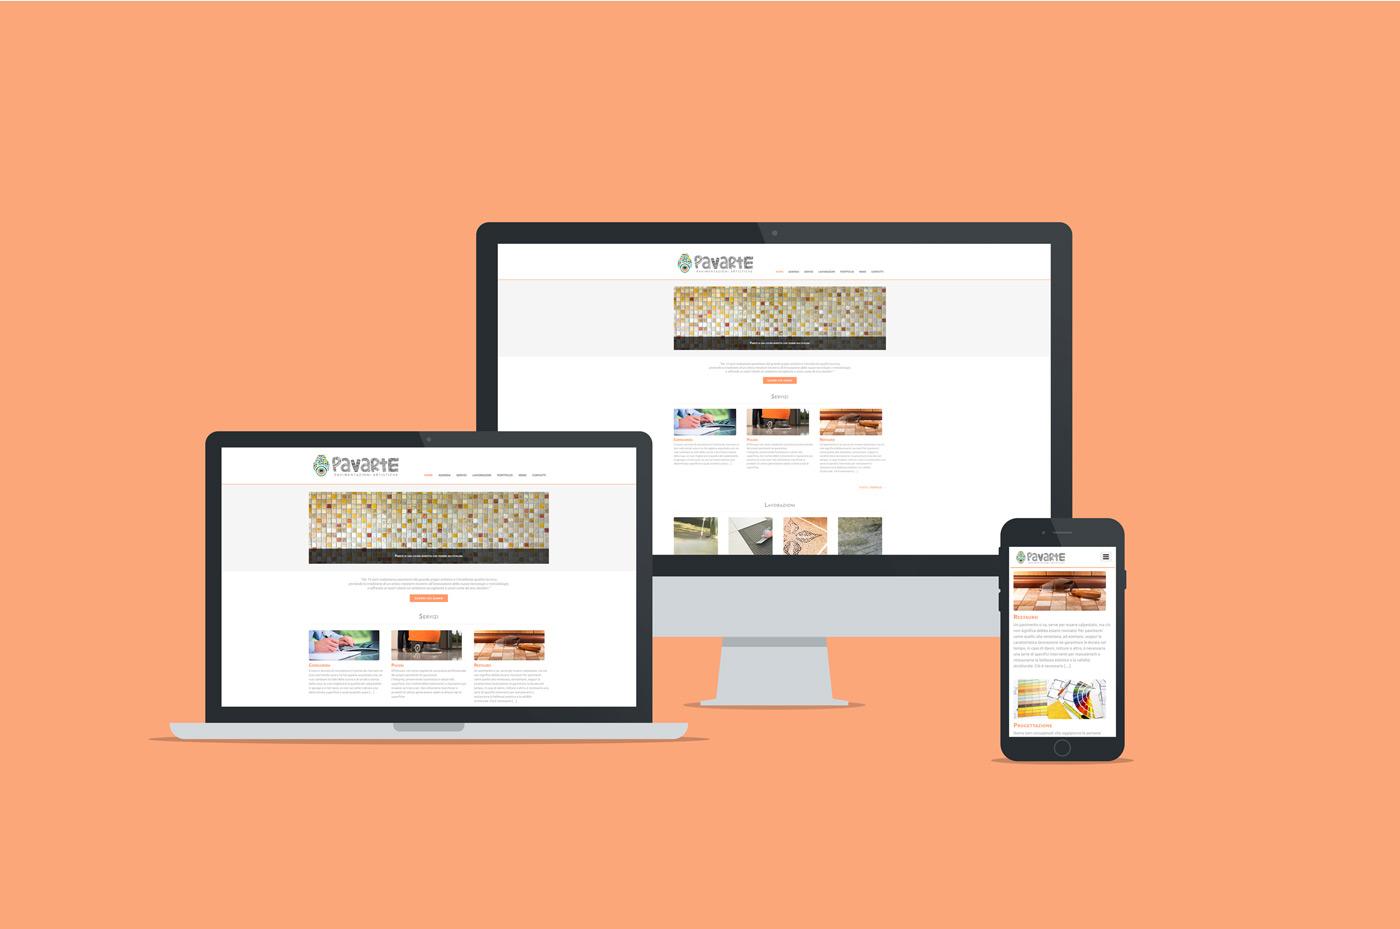 pavarte-website